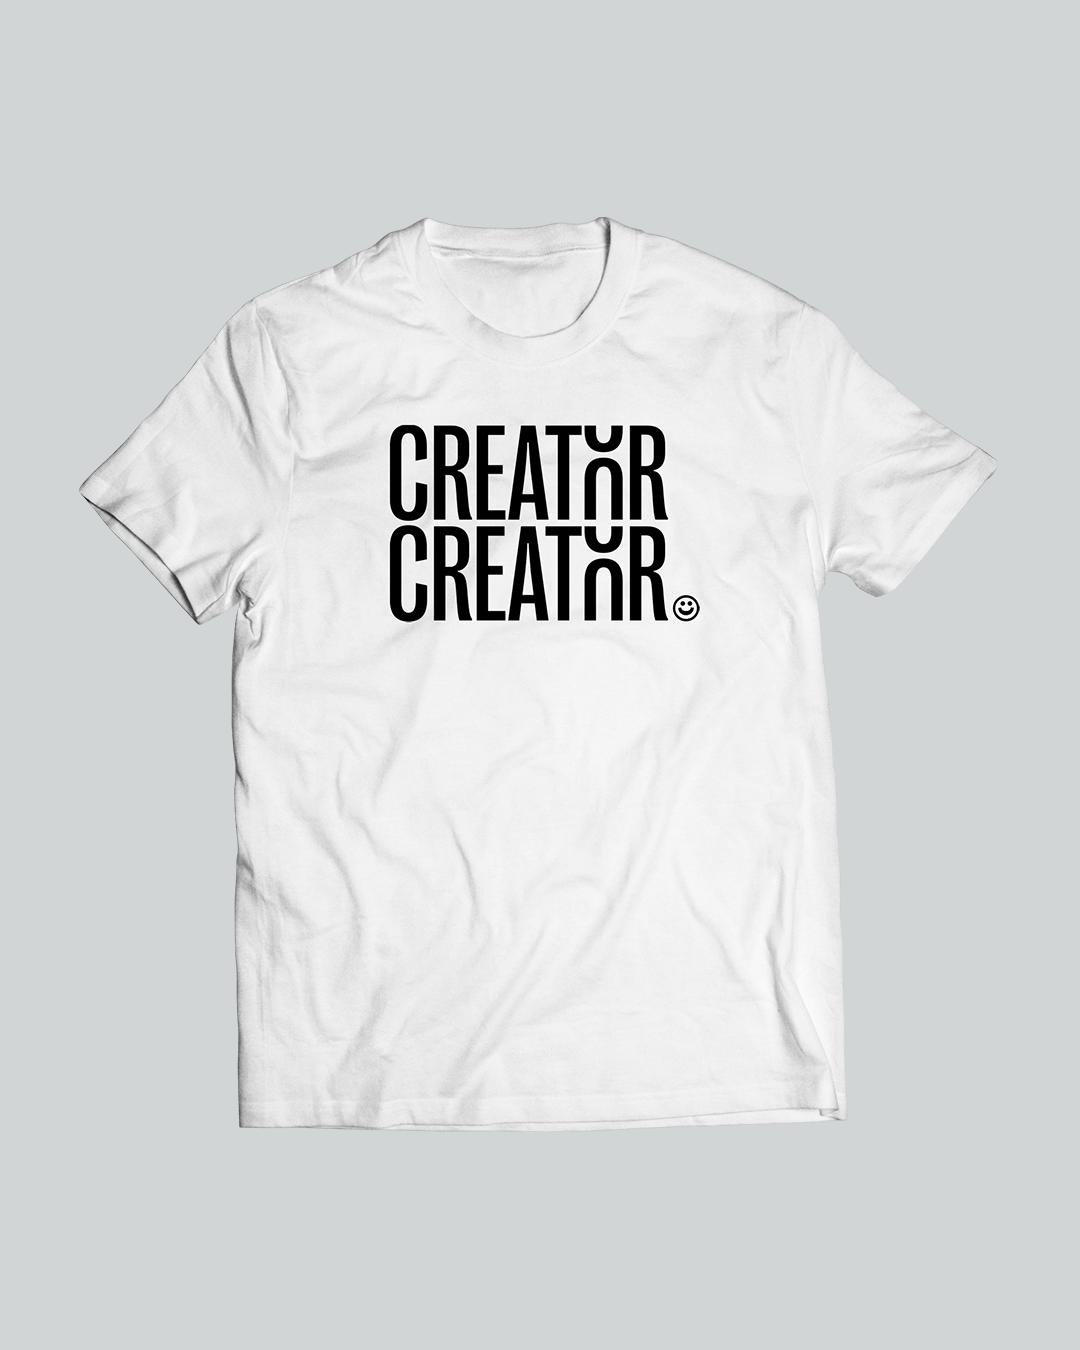 CREATOR ☺